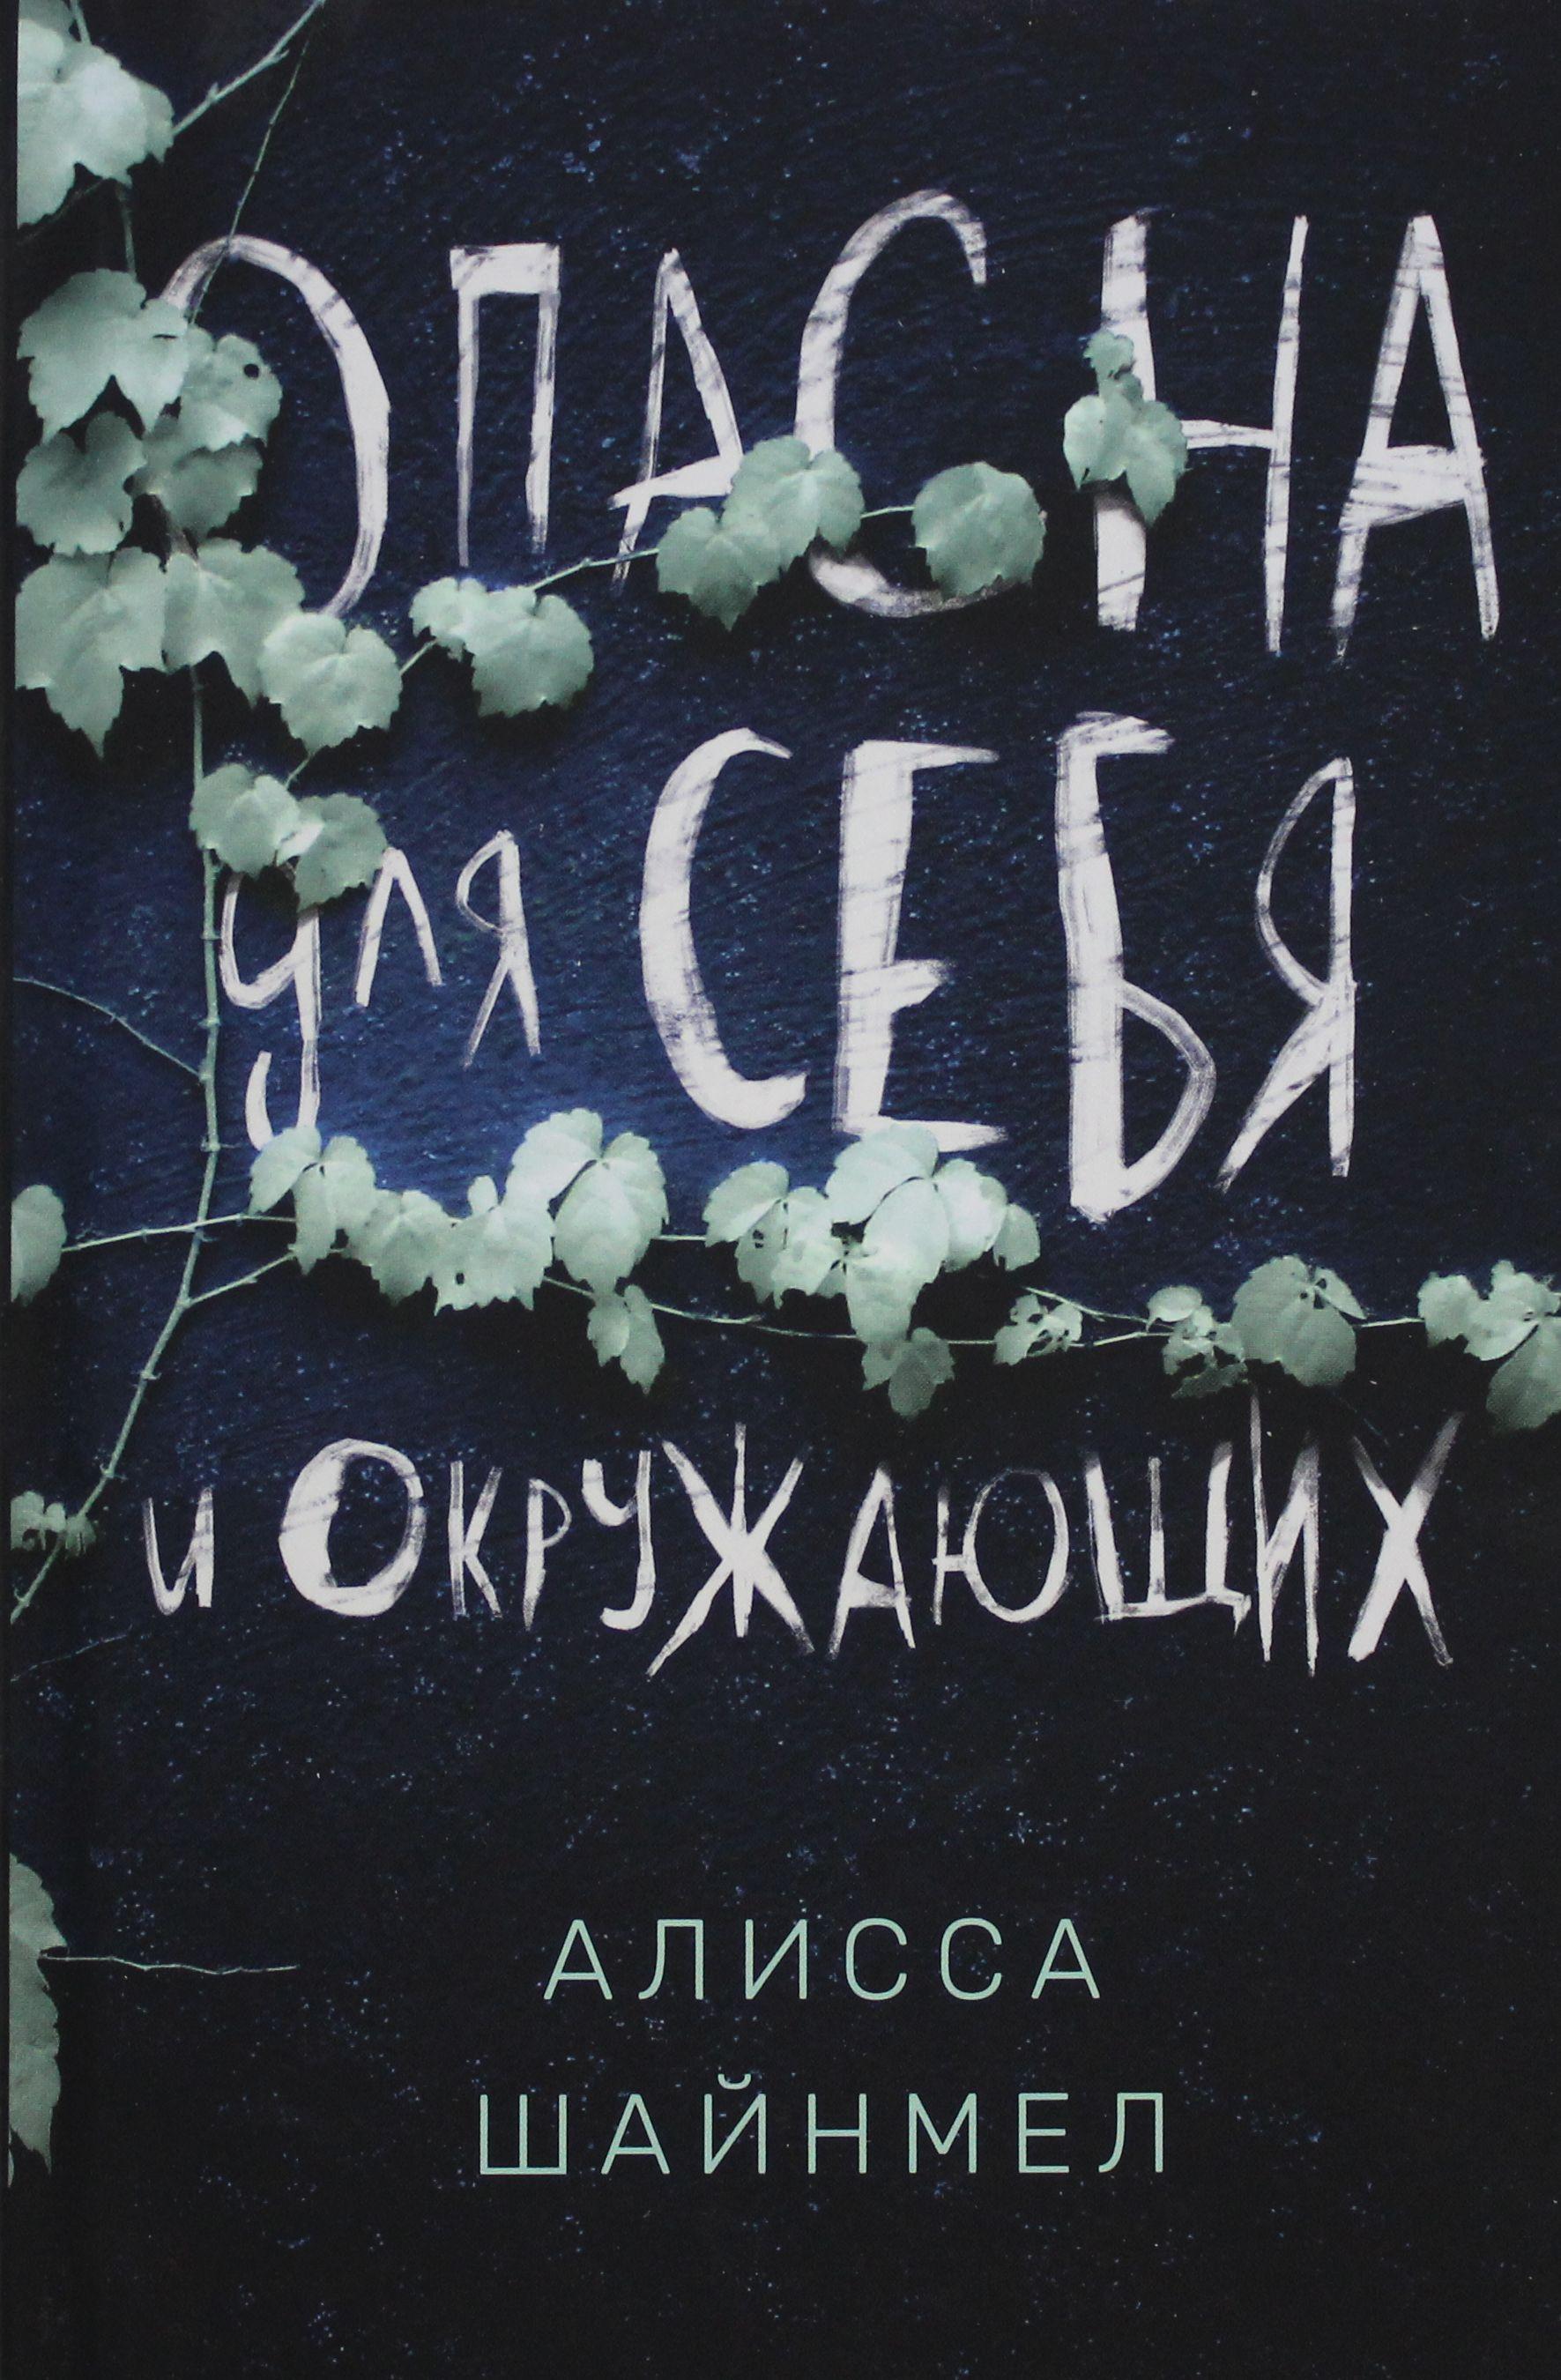 Alissa Shajnmel. Opasna dlja sebja i okruzhajuschikh